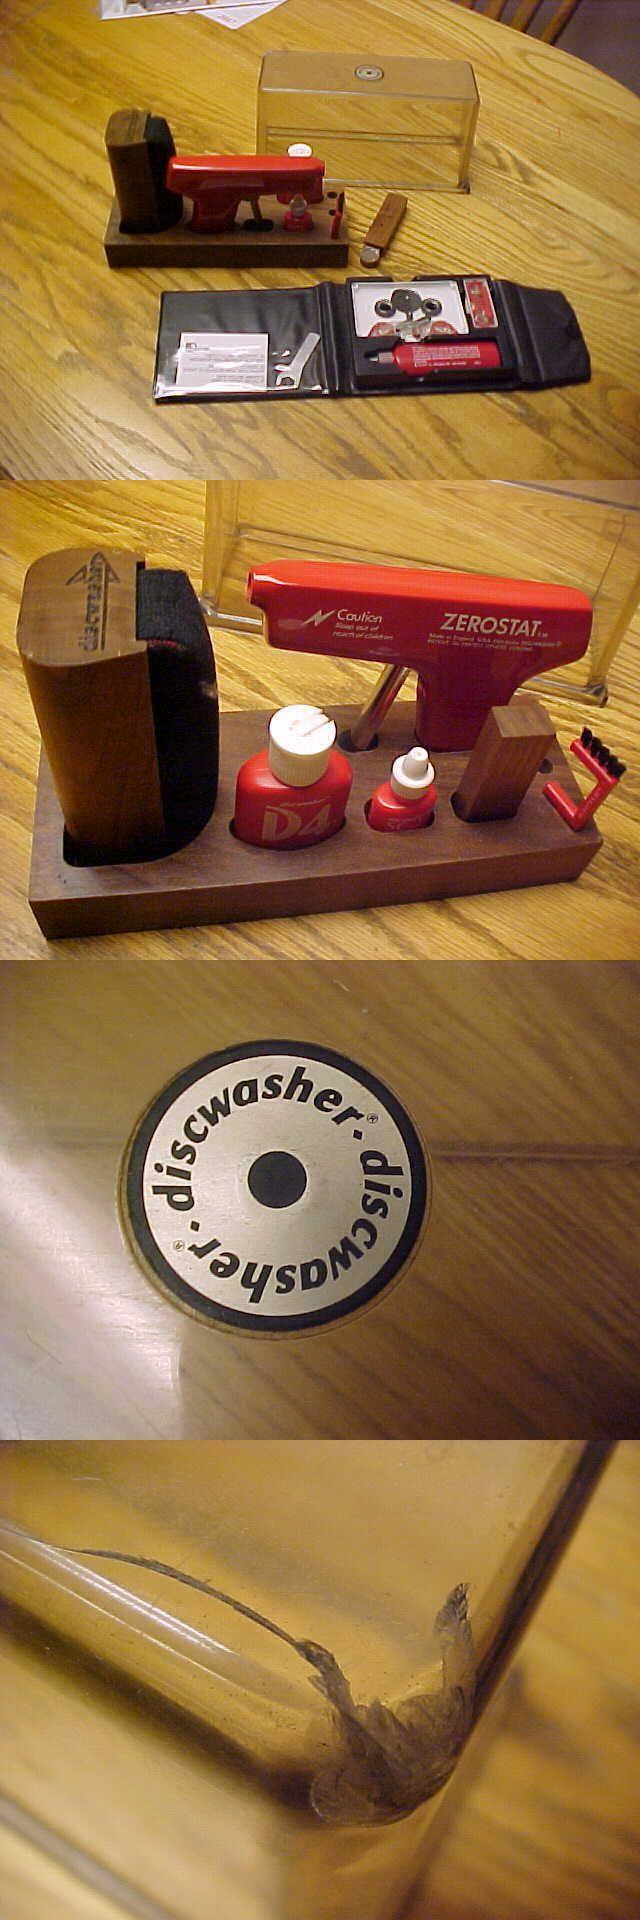 Vinyl Record Cleaning: Discwasher D3 Fluid Zerostat 3 Anti Static Gun Sc-2 Stylus Brush Cleaner Allsop3 -> BUY IT NOW ONLY: $75 on eBay!